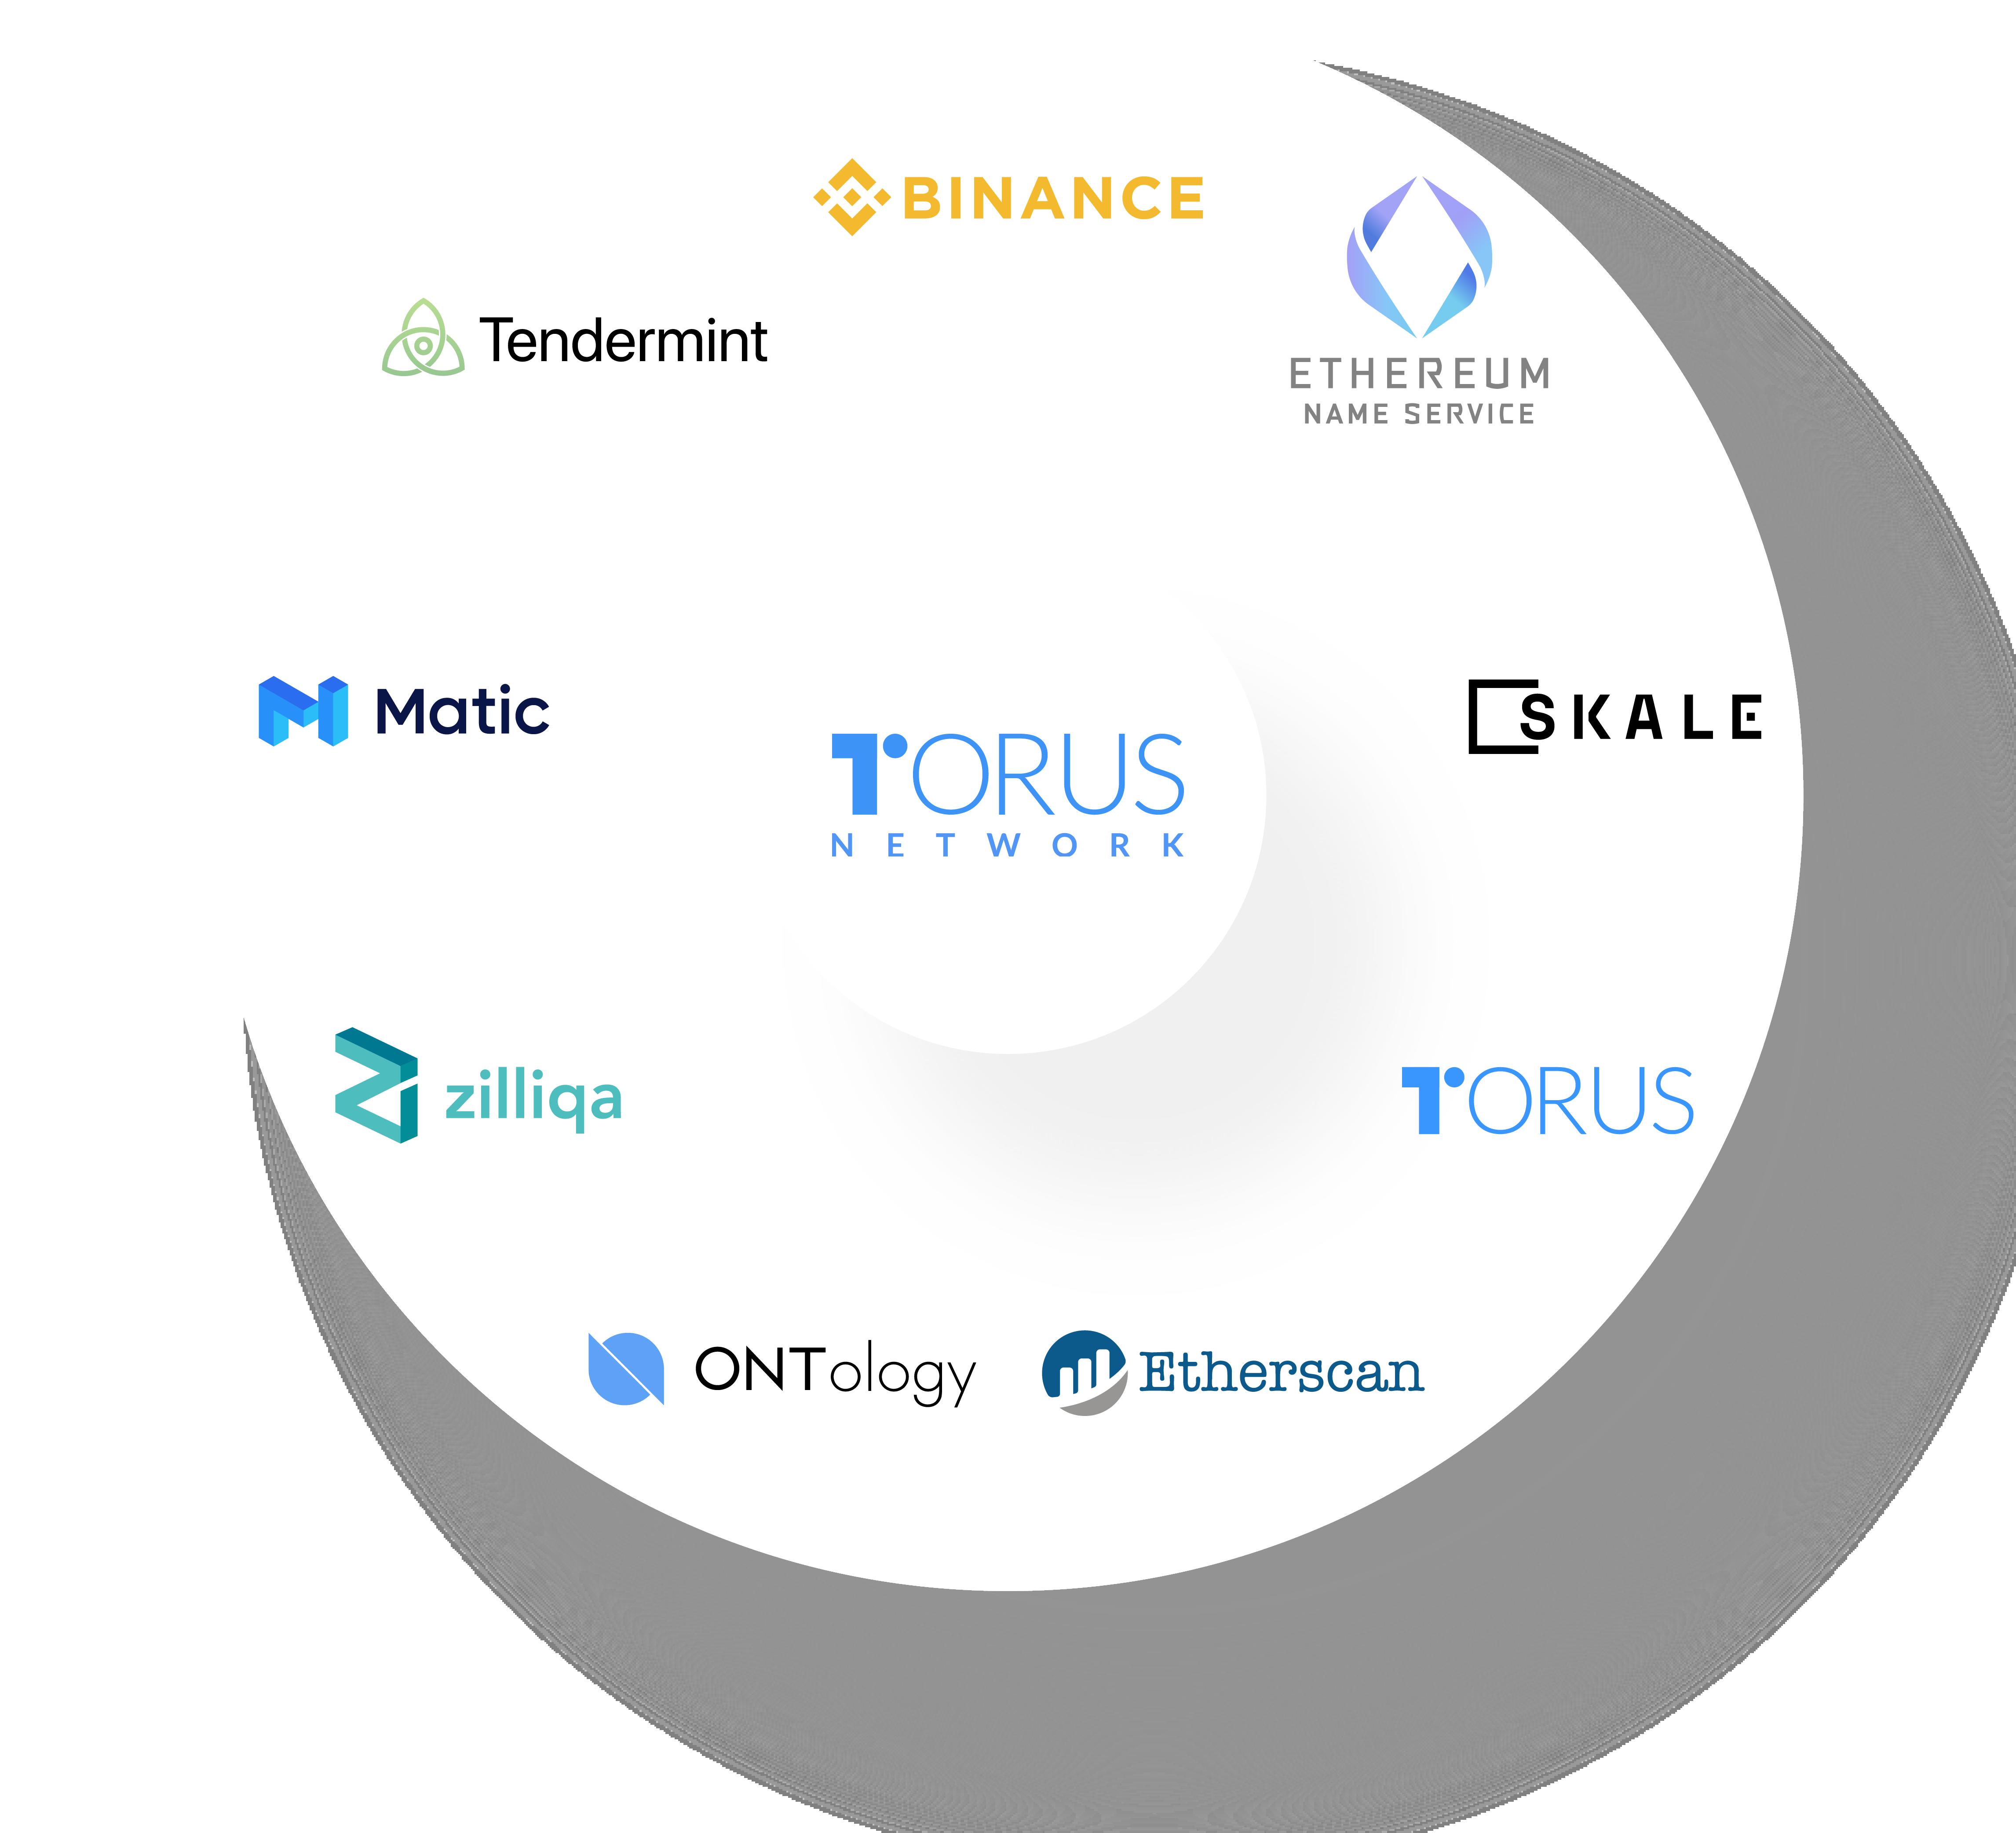 Torus-Network